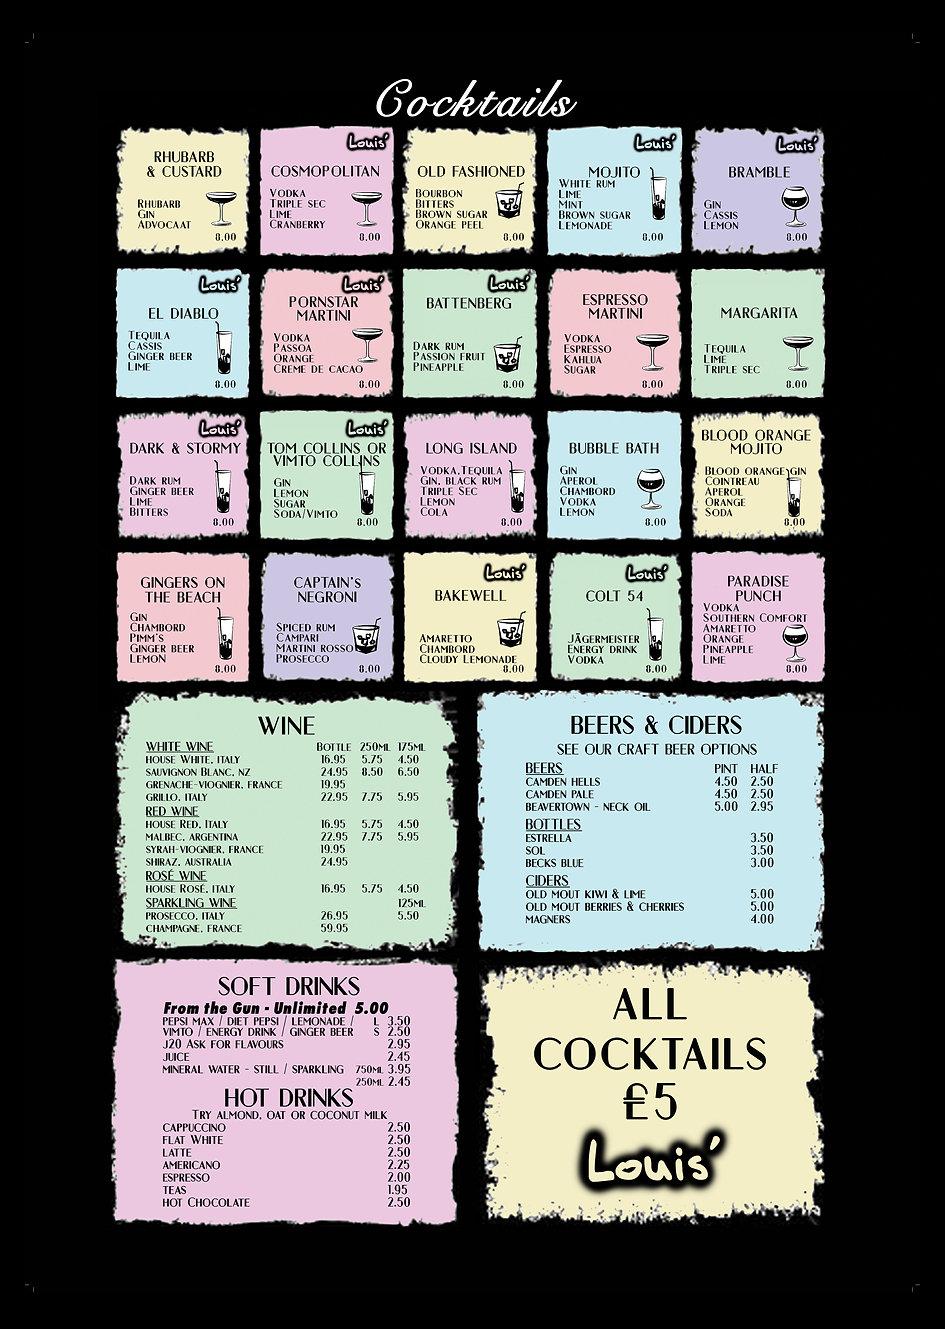 LARGE LOUIS DRINK MENU April20.jpg